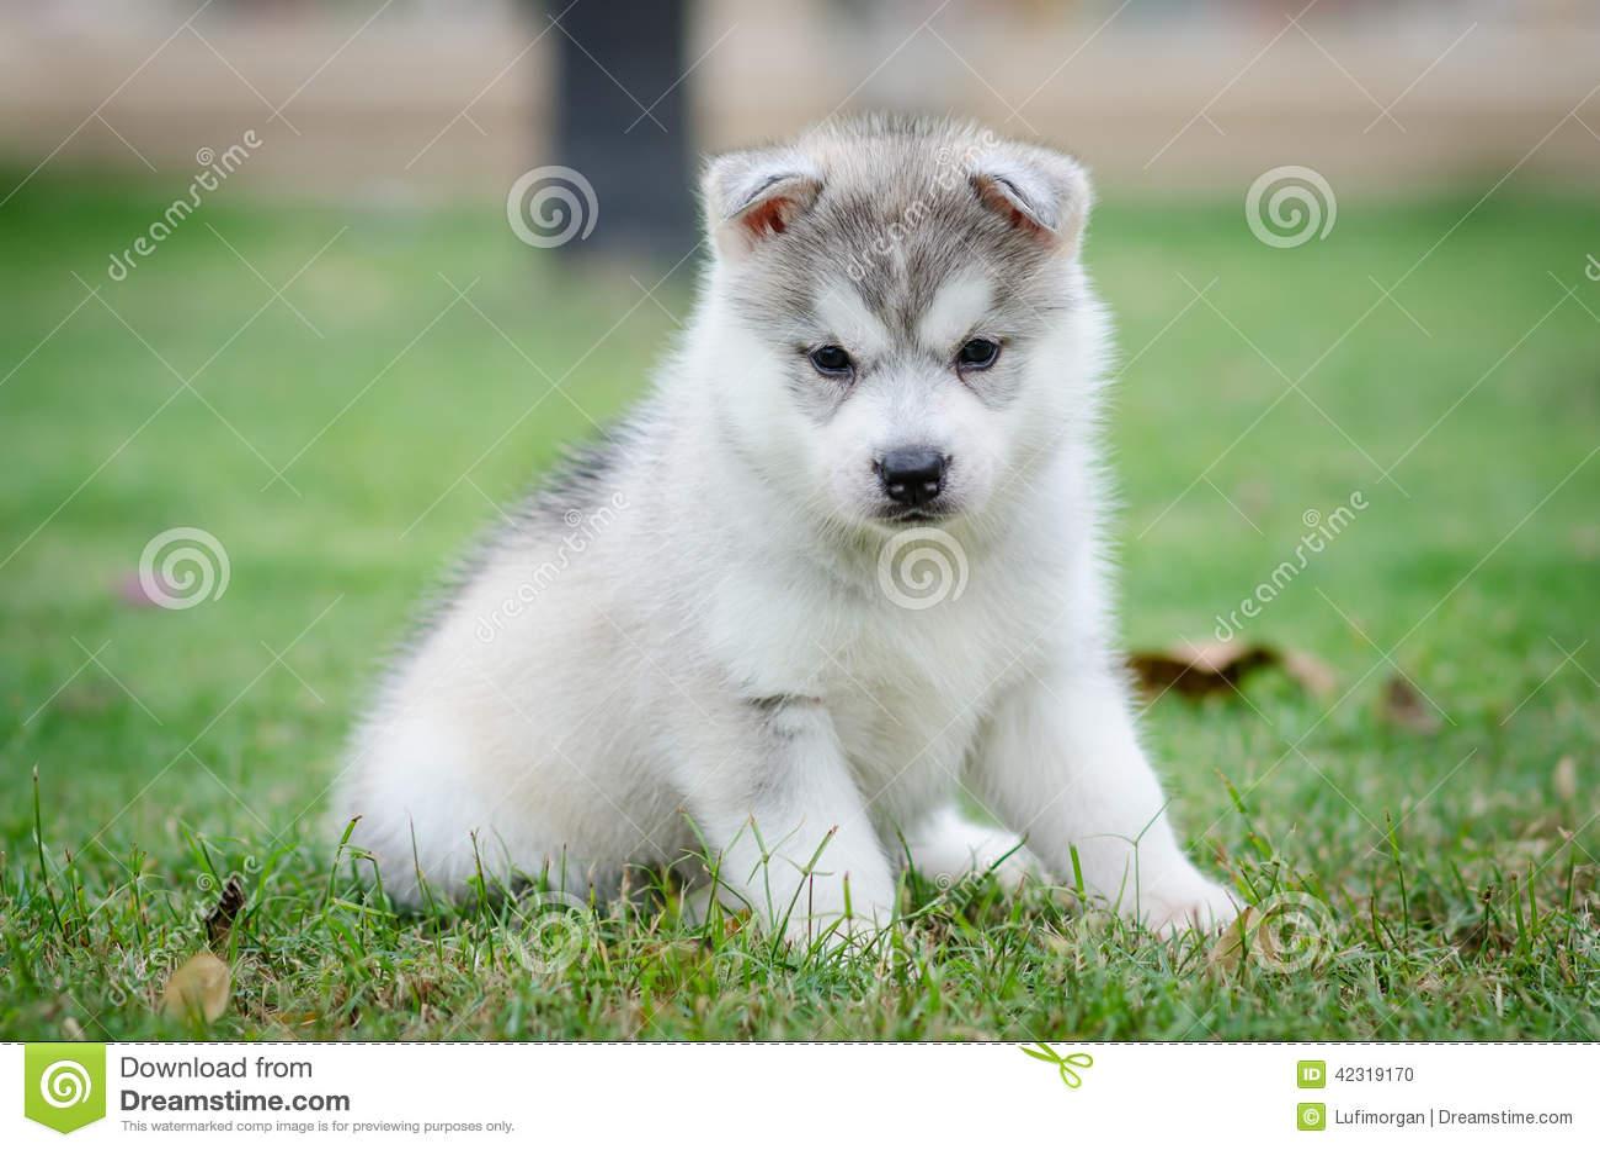 Siberian Husky Dog Puppy Stock Photo Image Of Outdoors 42319170